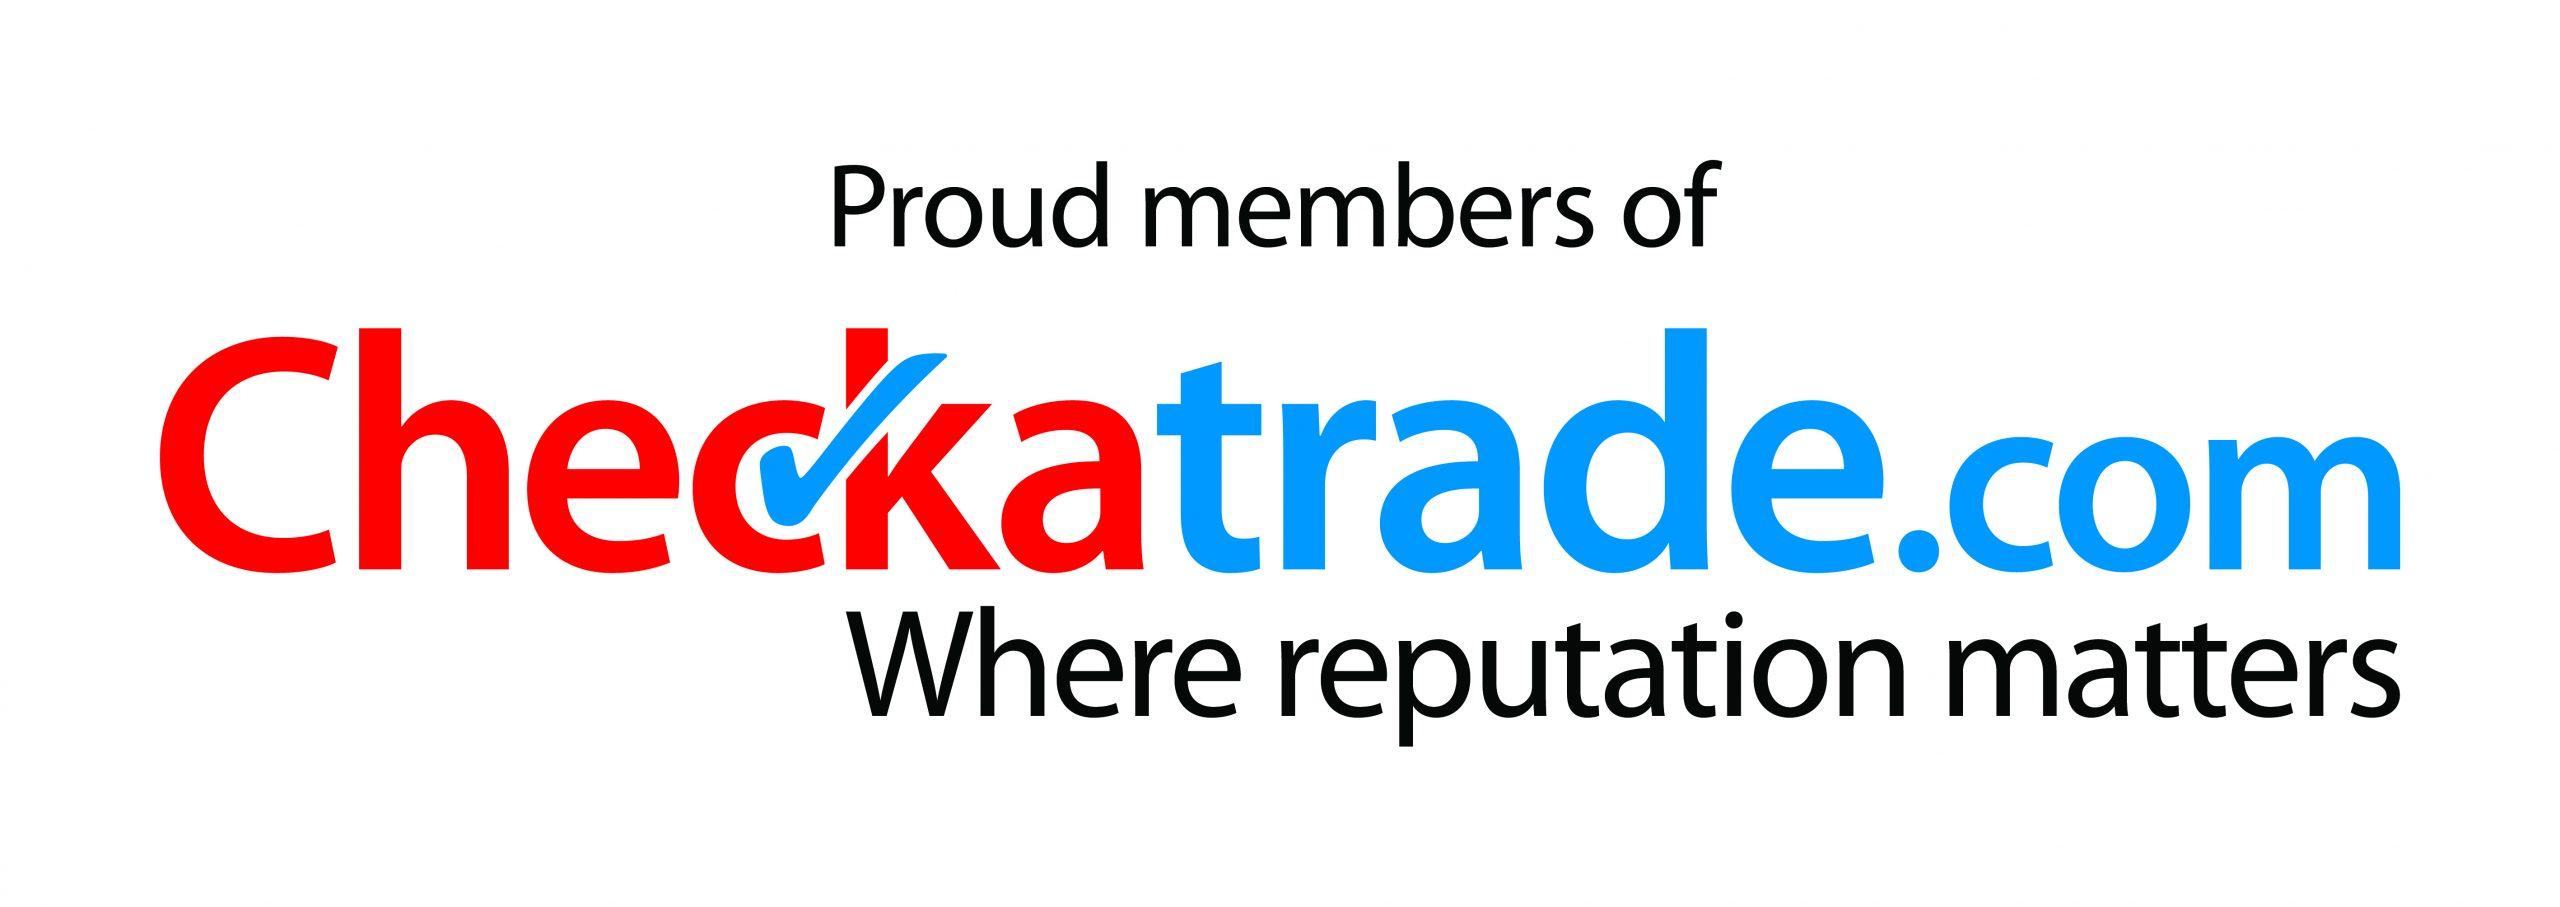 Checkatrade Members